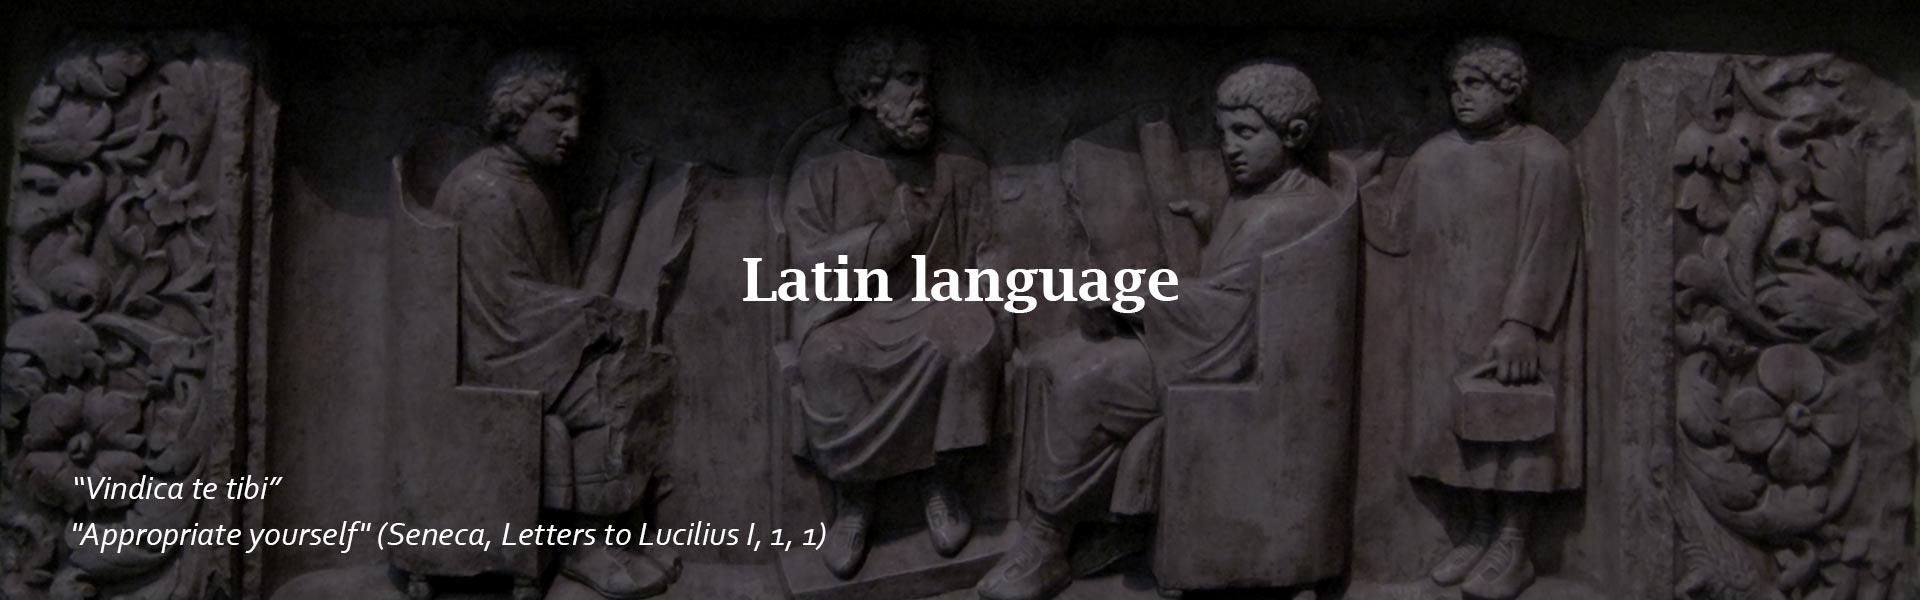 Latin-language alif pisa